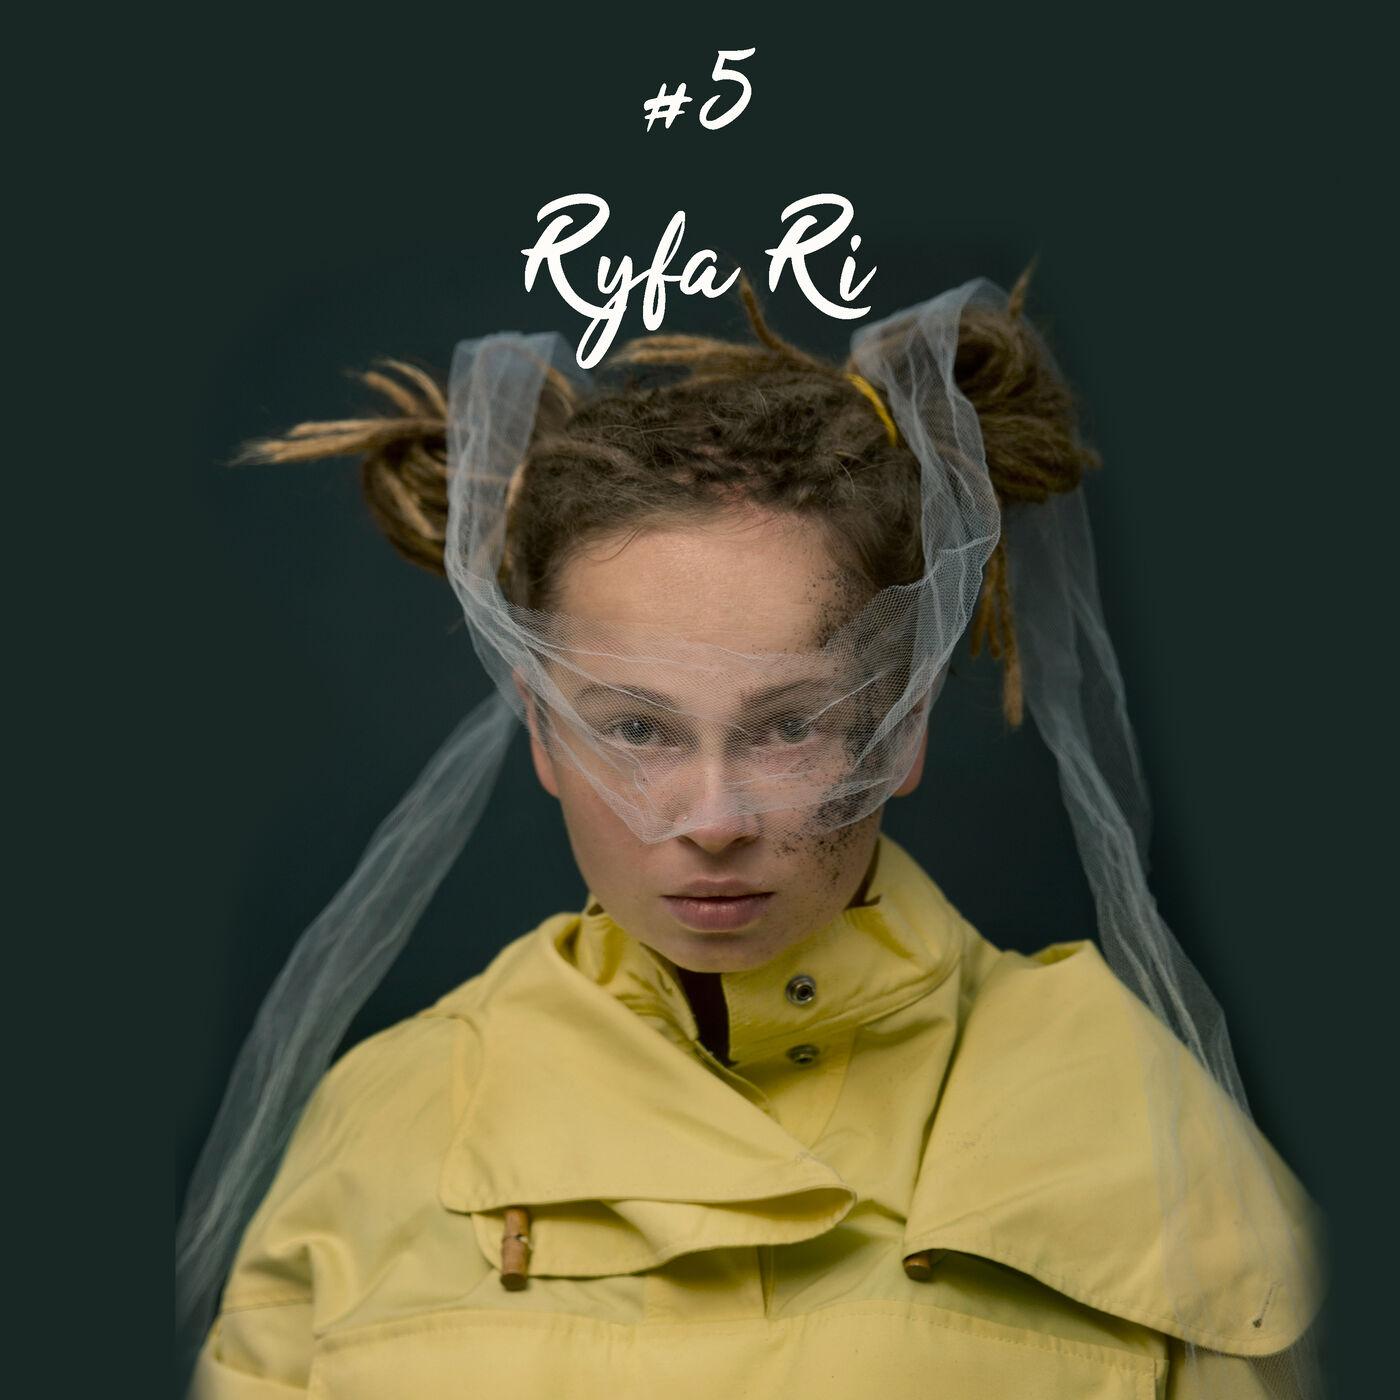 #5 Ryfa Ri